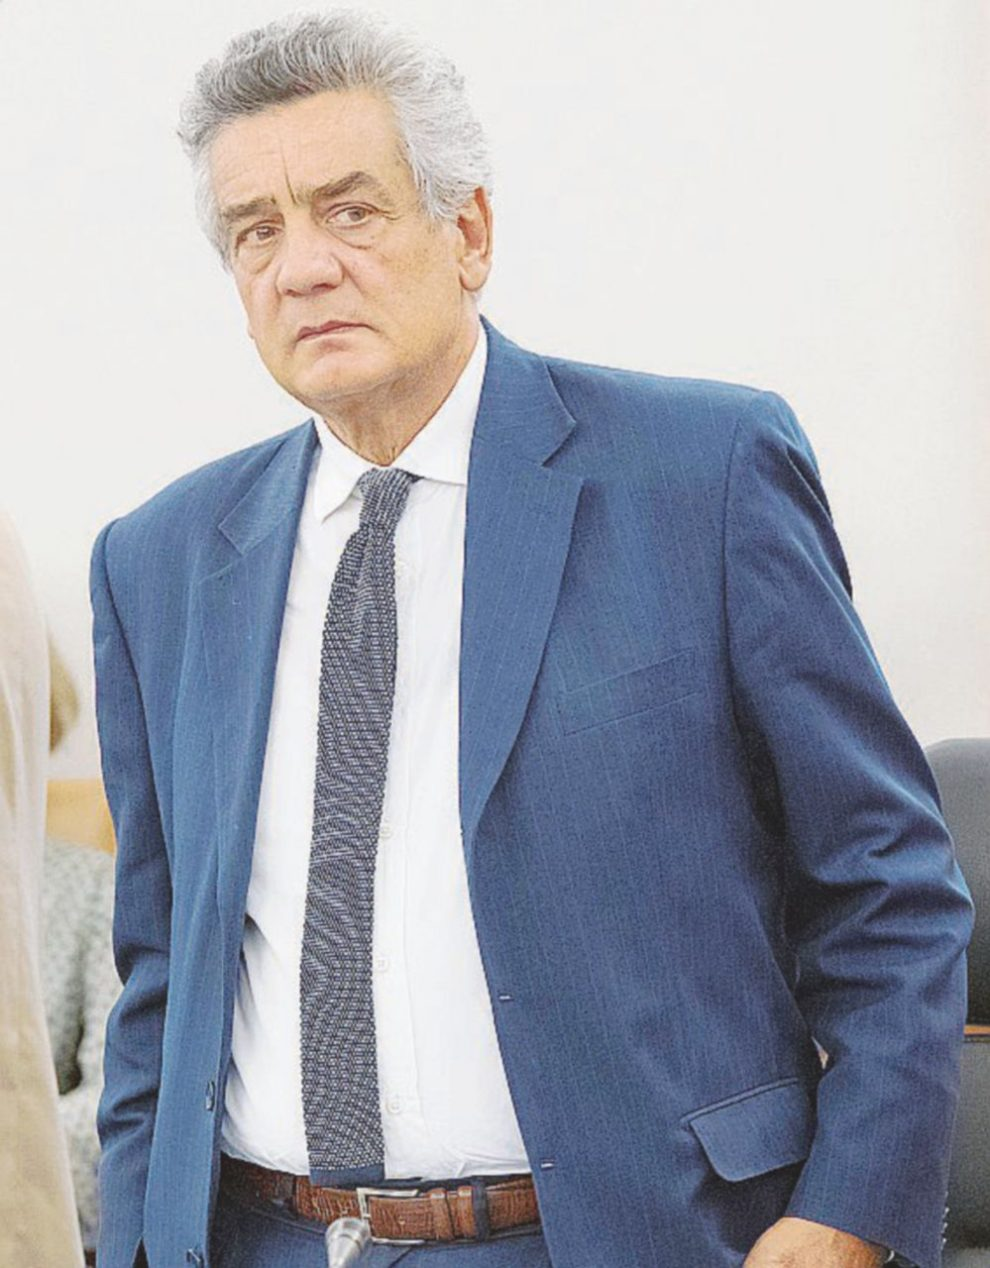 Il cecchino – Giuseppe Fanfani –  Ansa